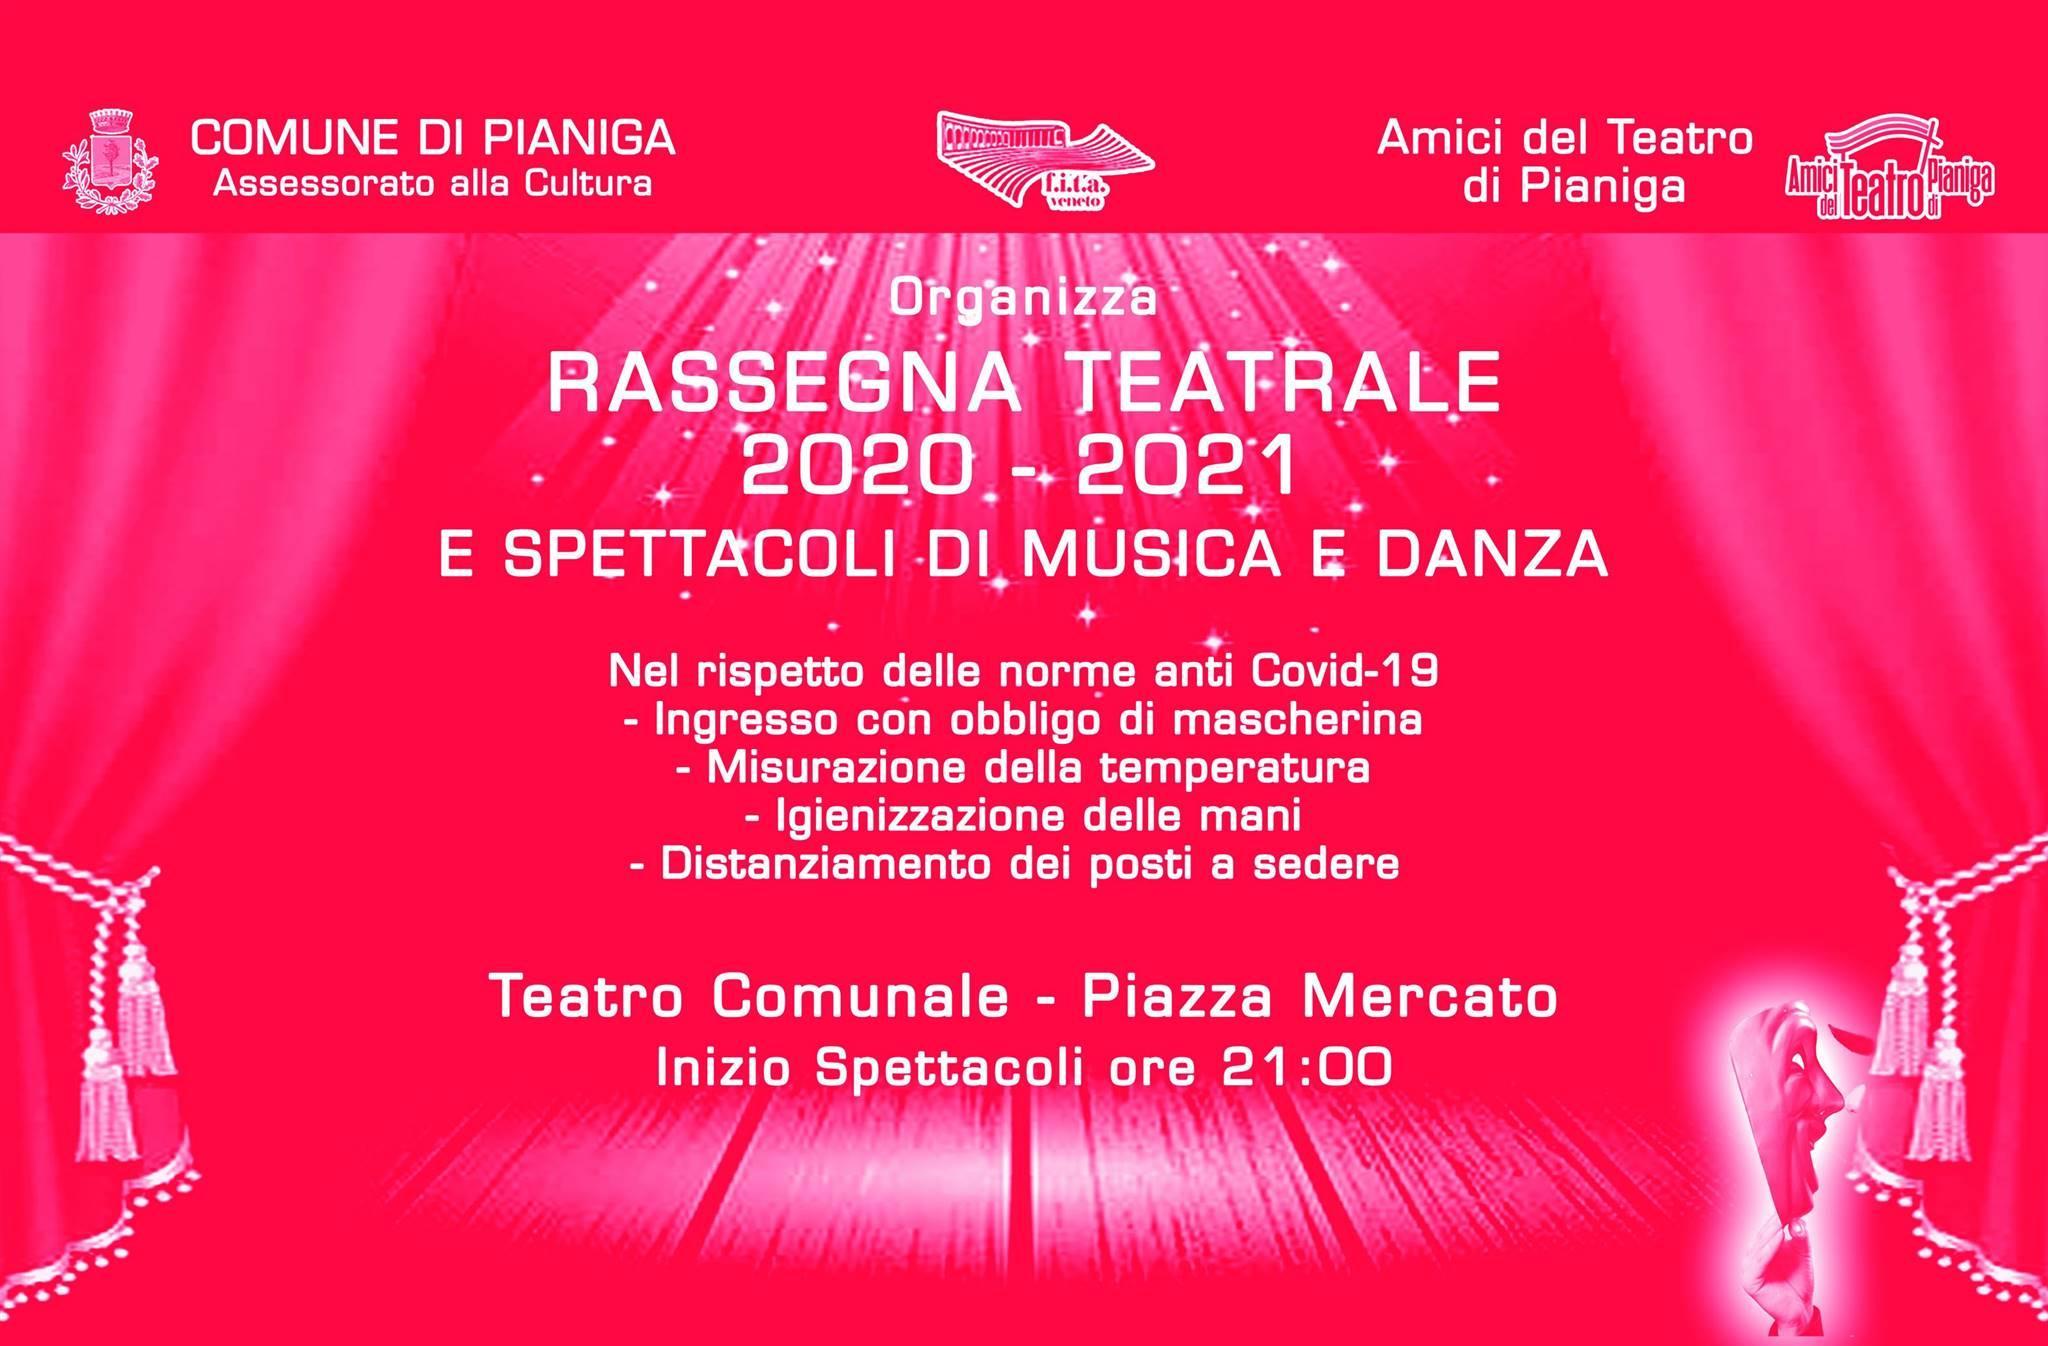 Rassegna Teatrale 2020-2021 Pianiga